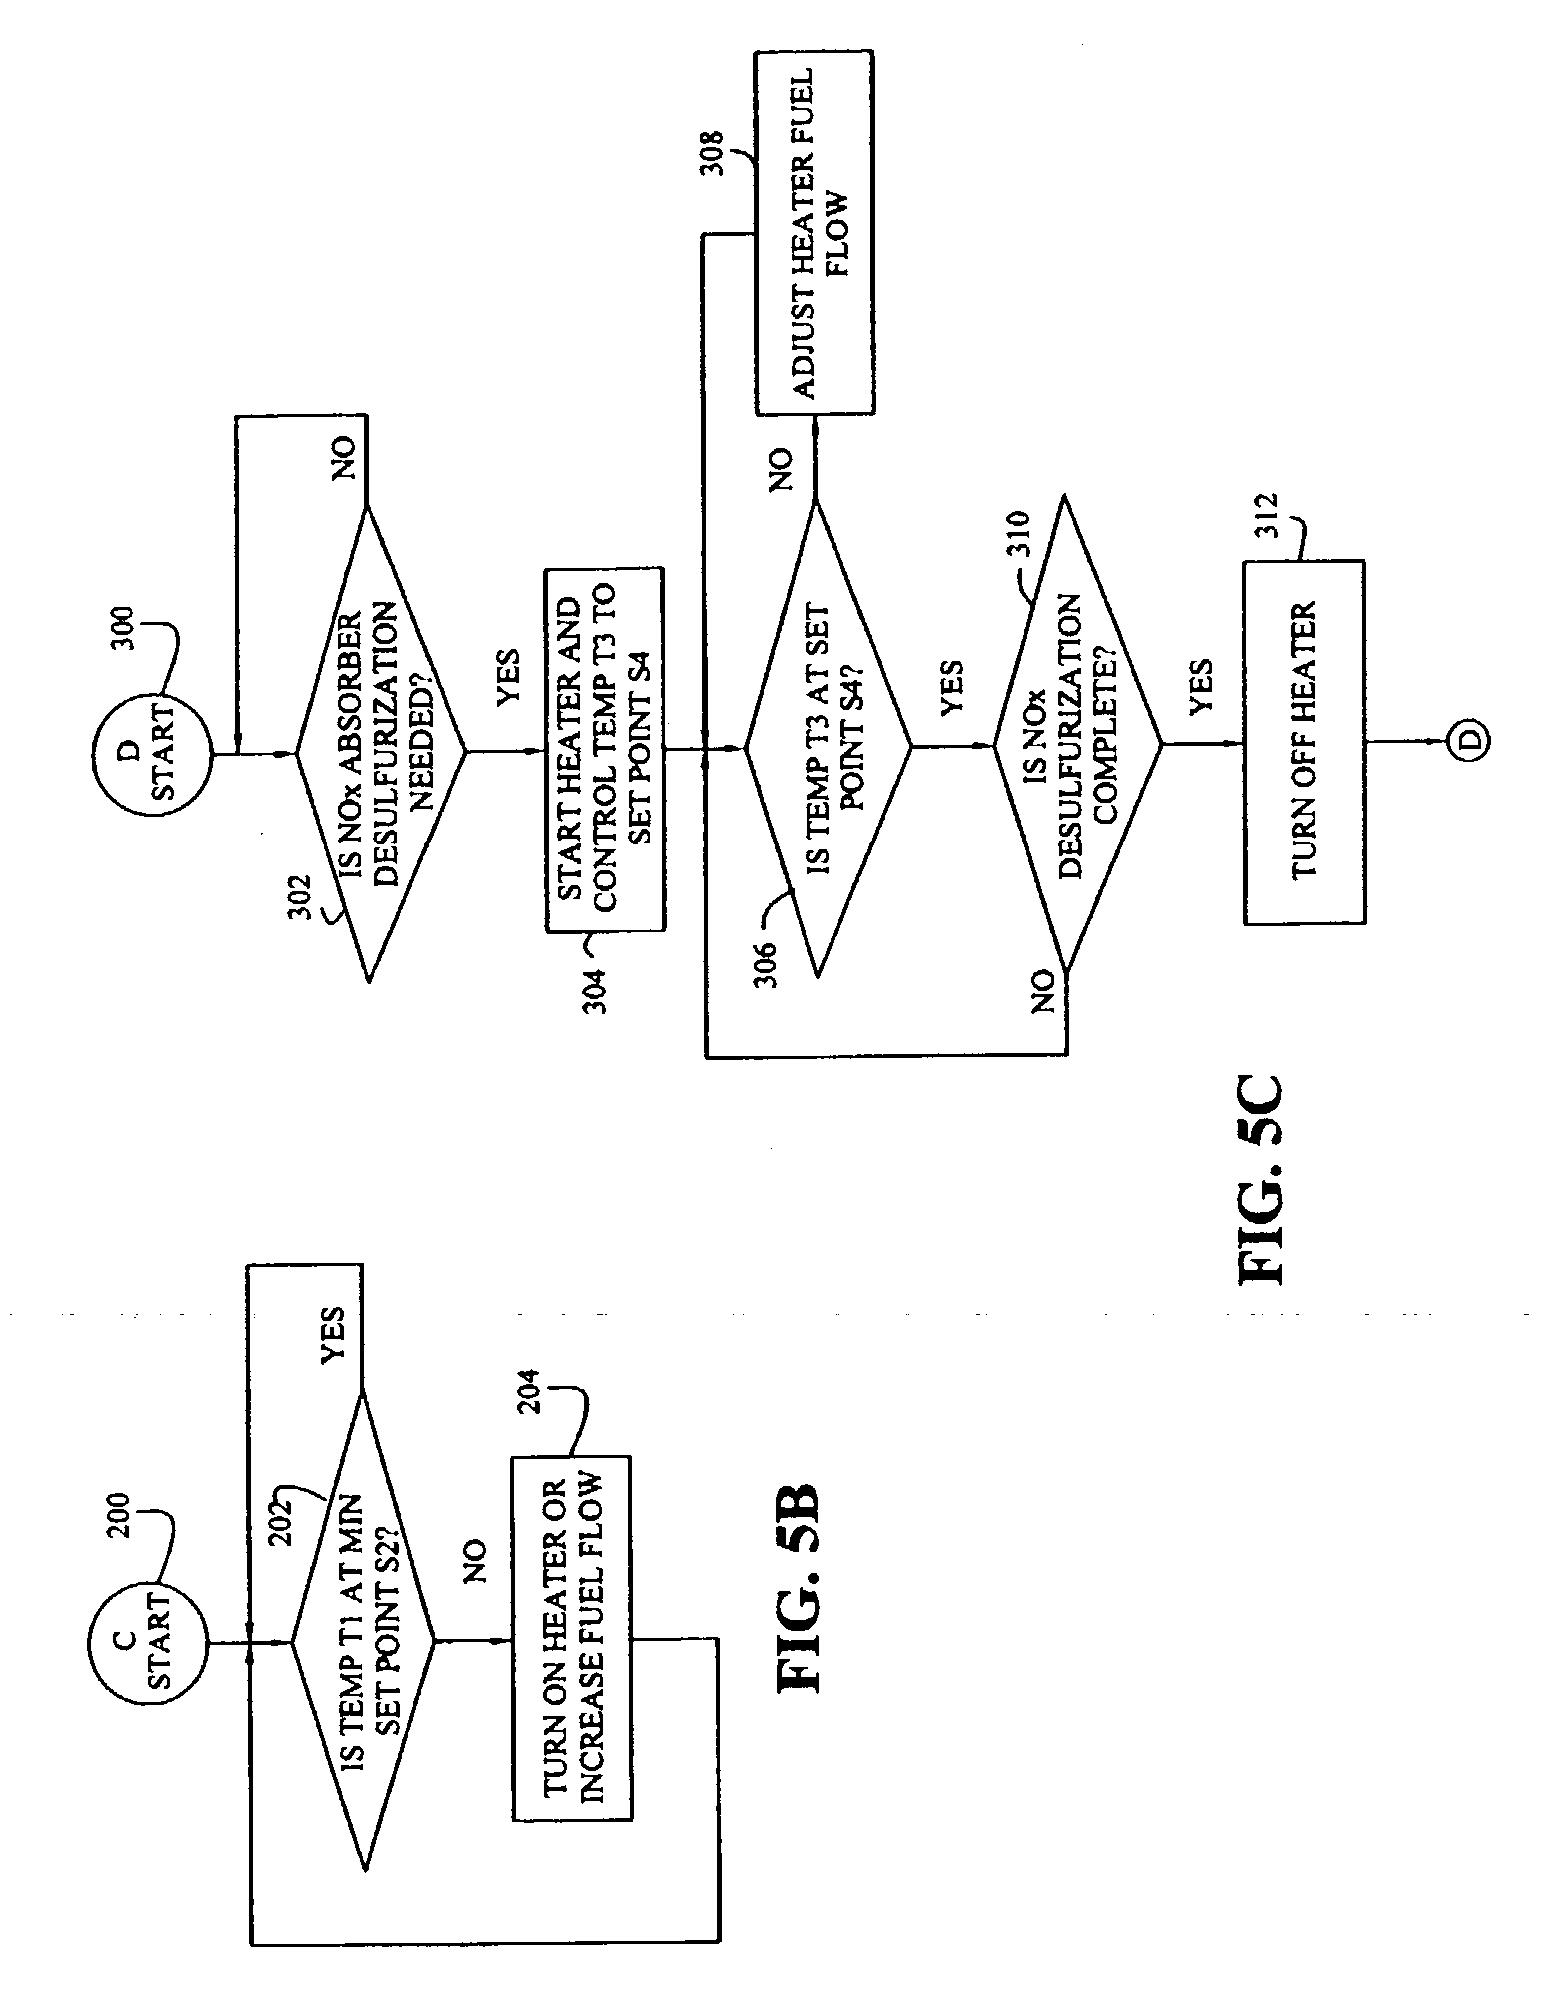 evinrude 12 24 trolling motor wiring diagram circuit